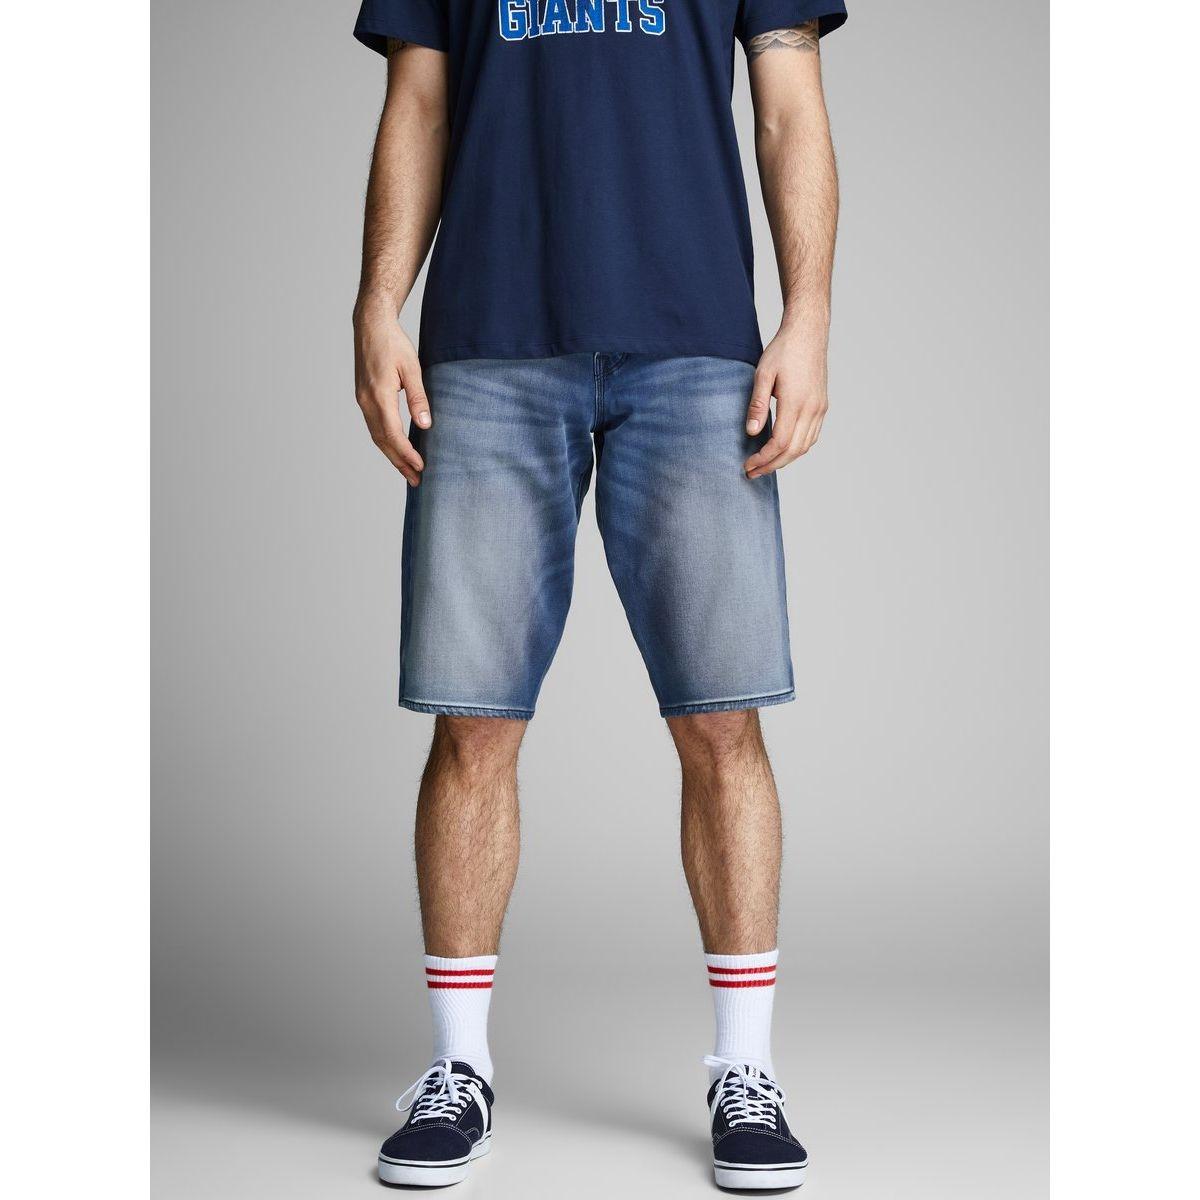 Shorts en jean Long Indigo Knit